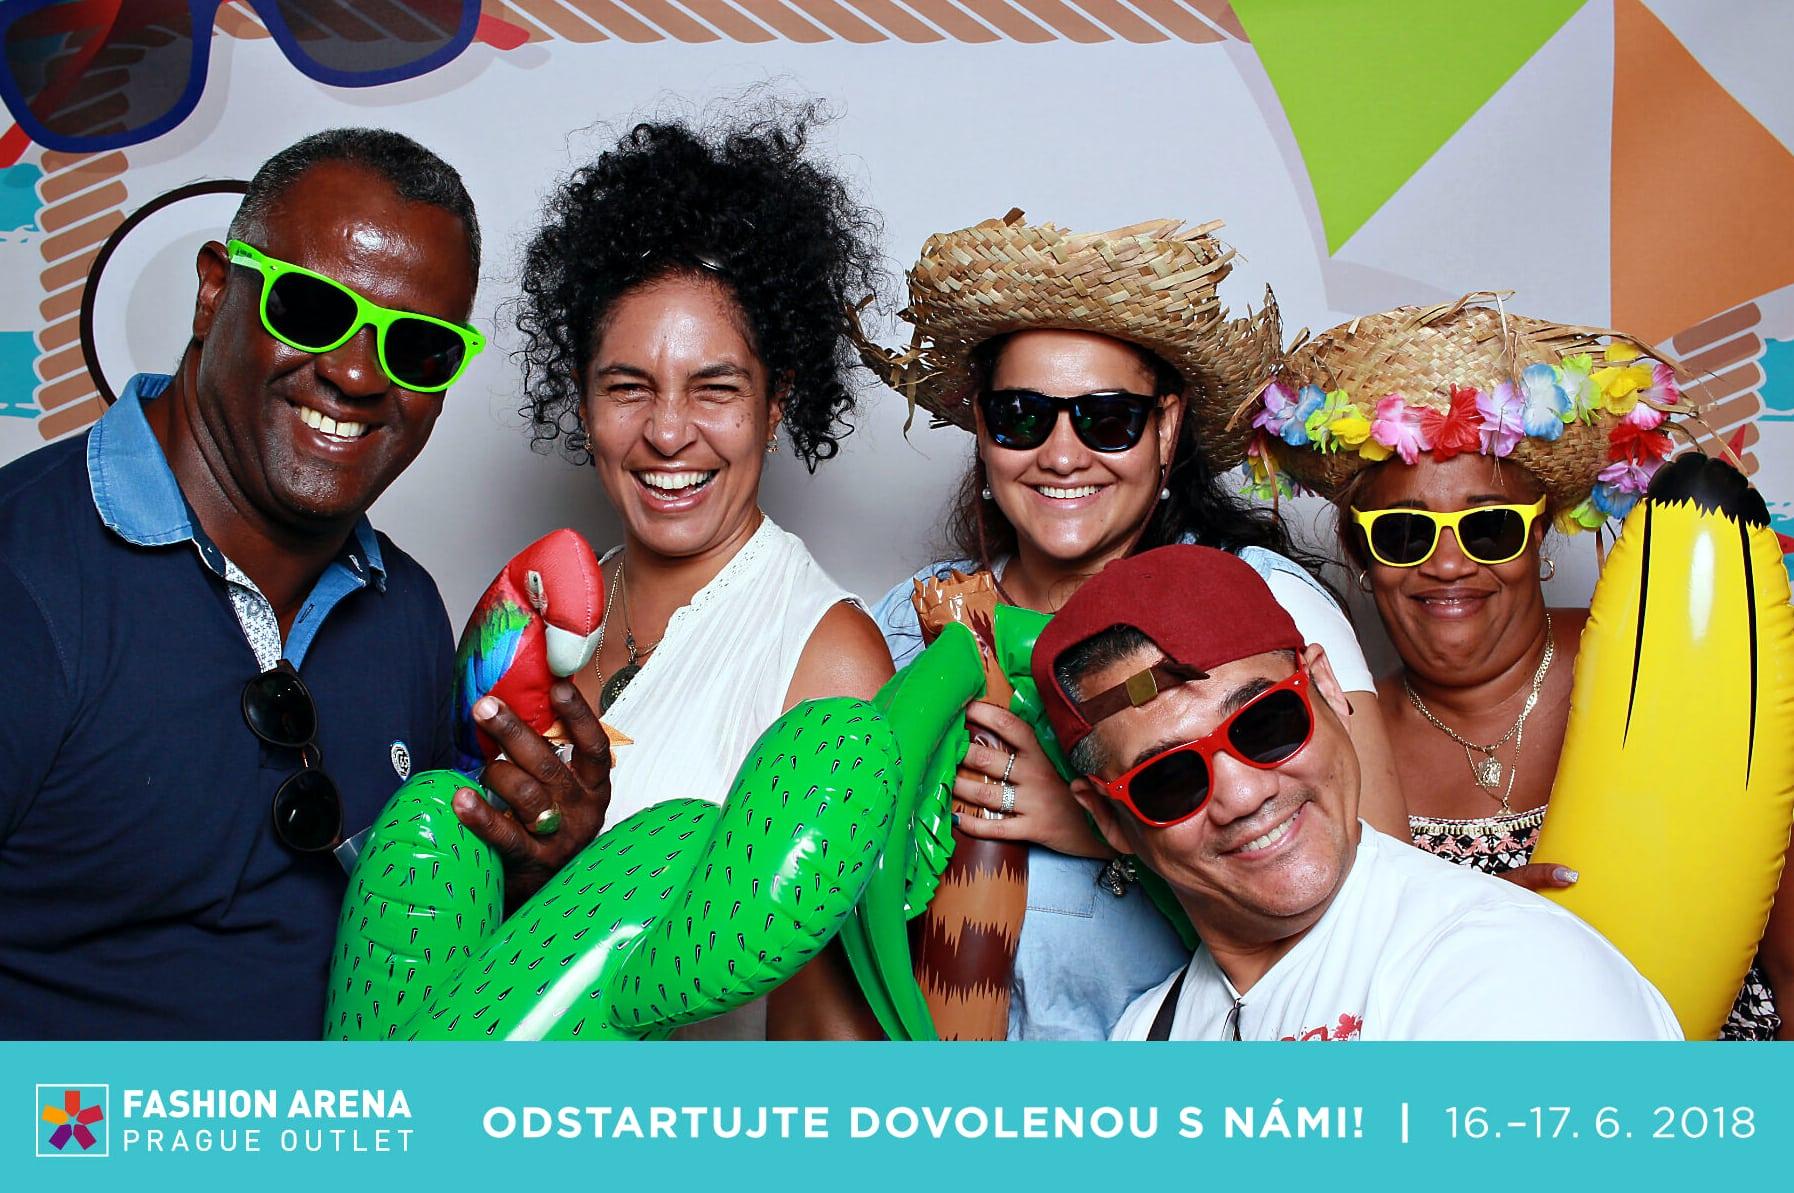 fotokoutek-fashion-arena-odstartujte-sezonu-s-nami-17-6-2018-440541